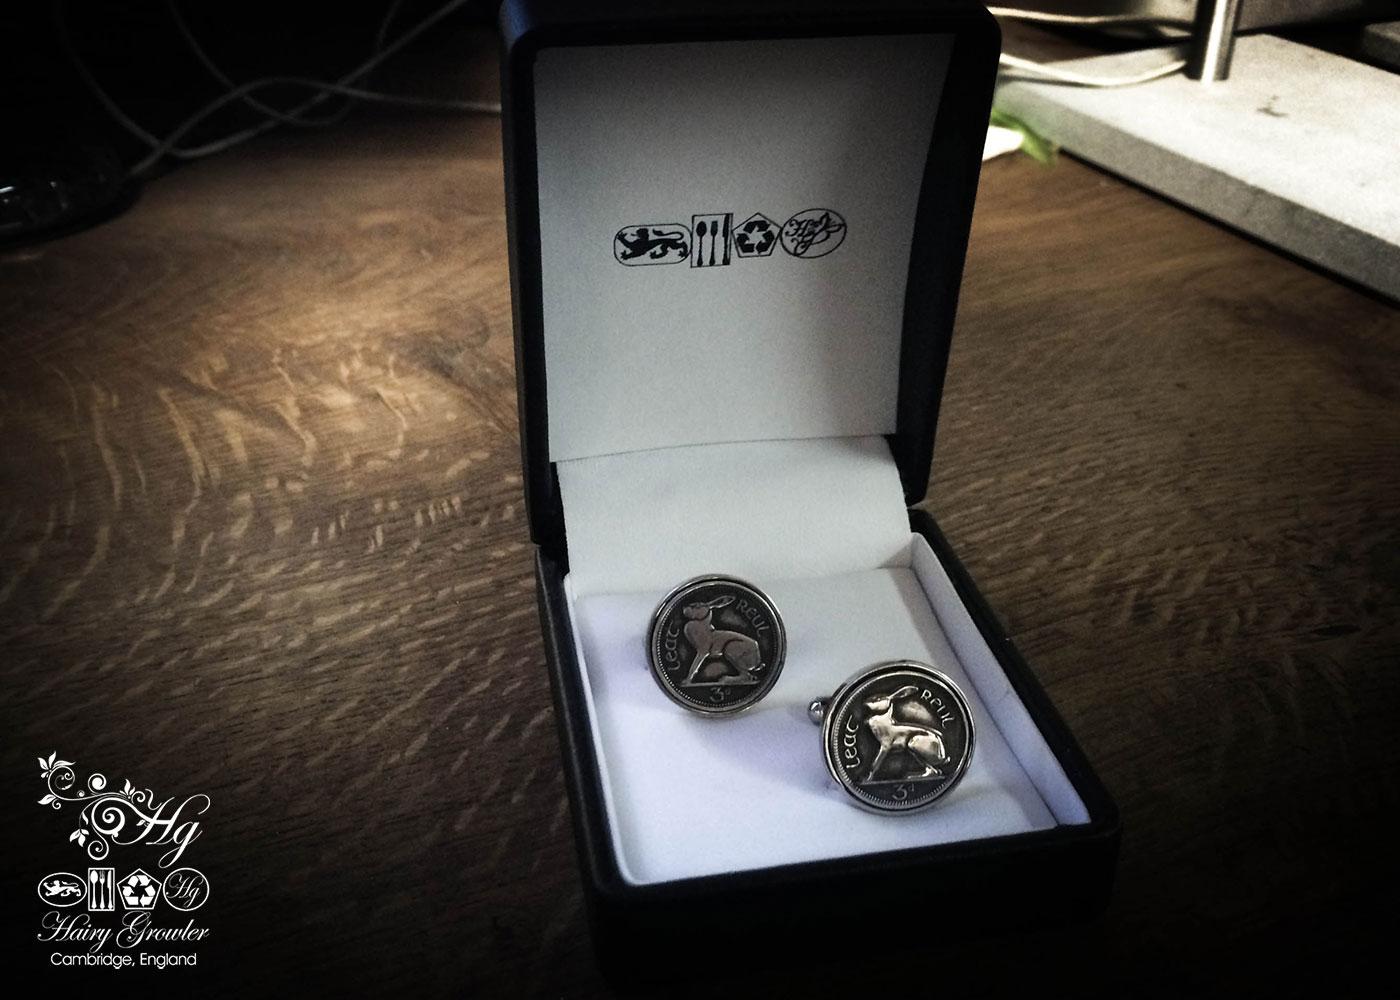 Irish hare threepence coin cufflinks handmade in the Hg workshop